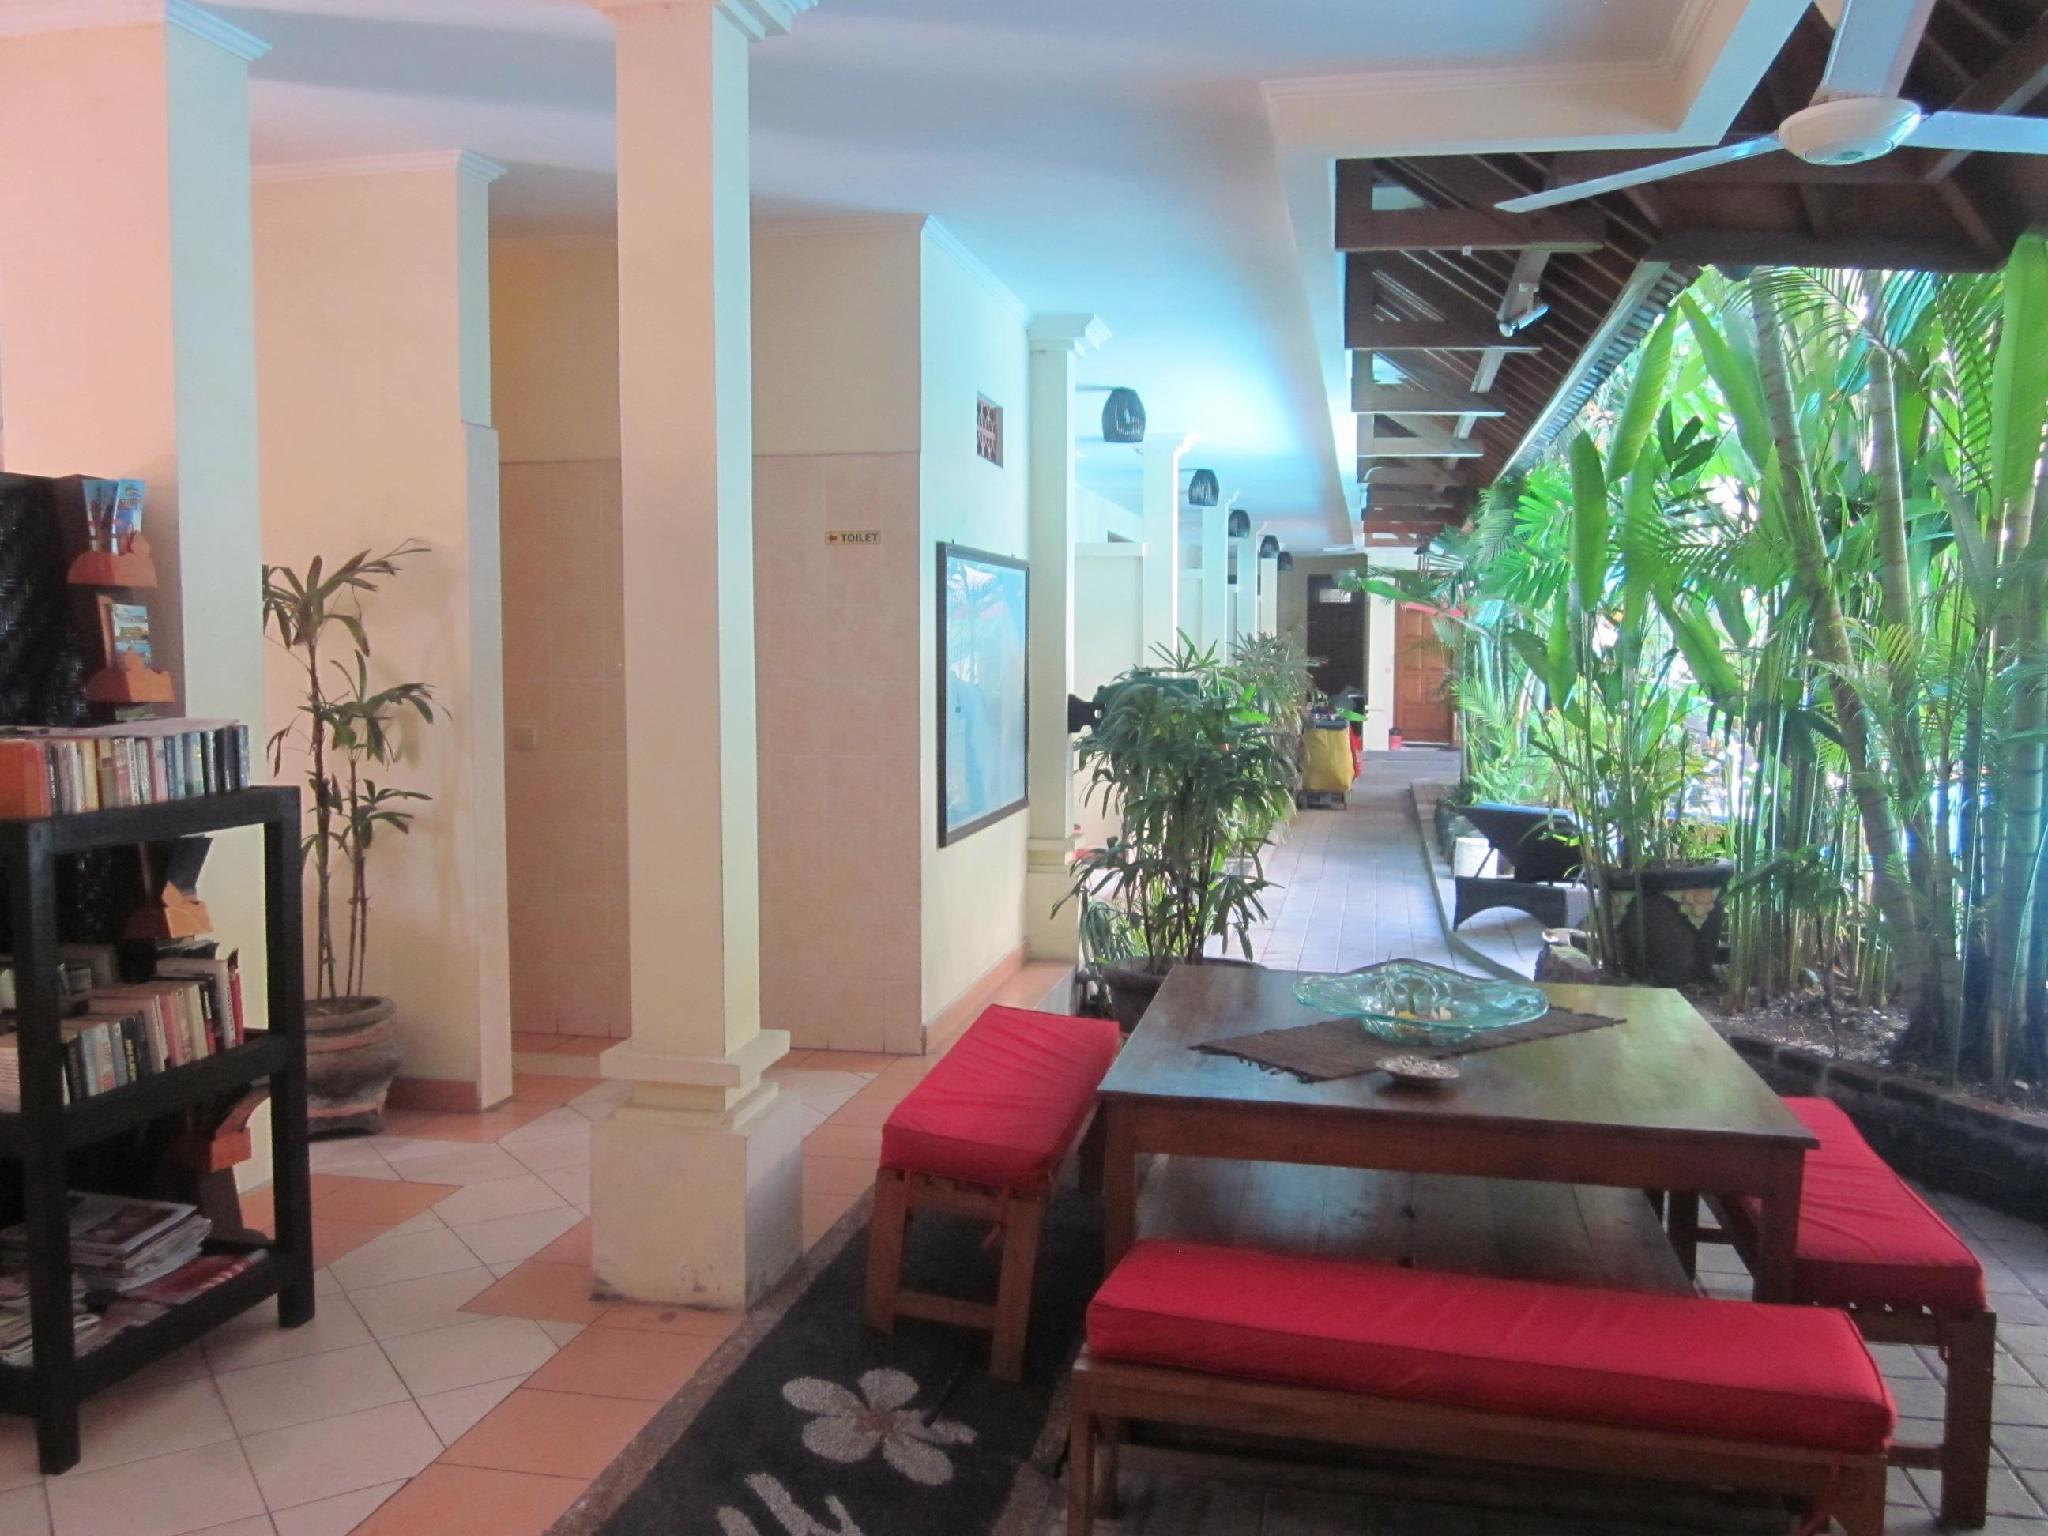 Hotel Secret Garden Inn Kuta - Jalan Popies I Kuta - Bali